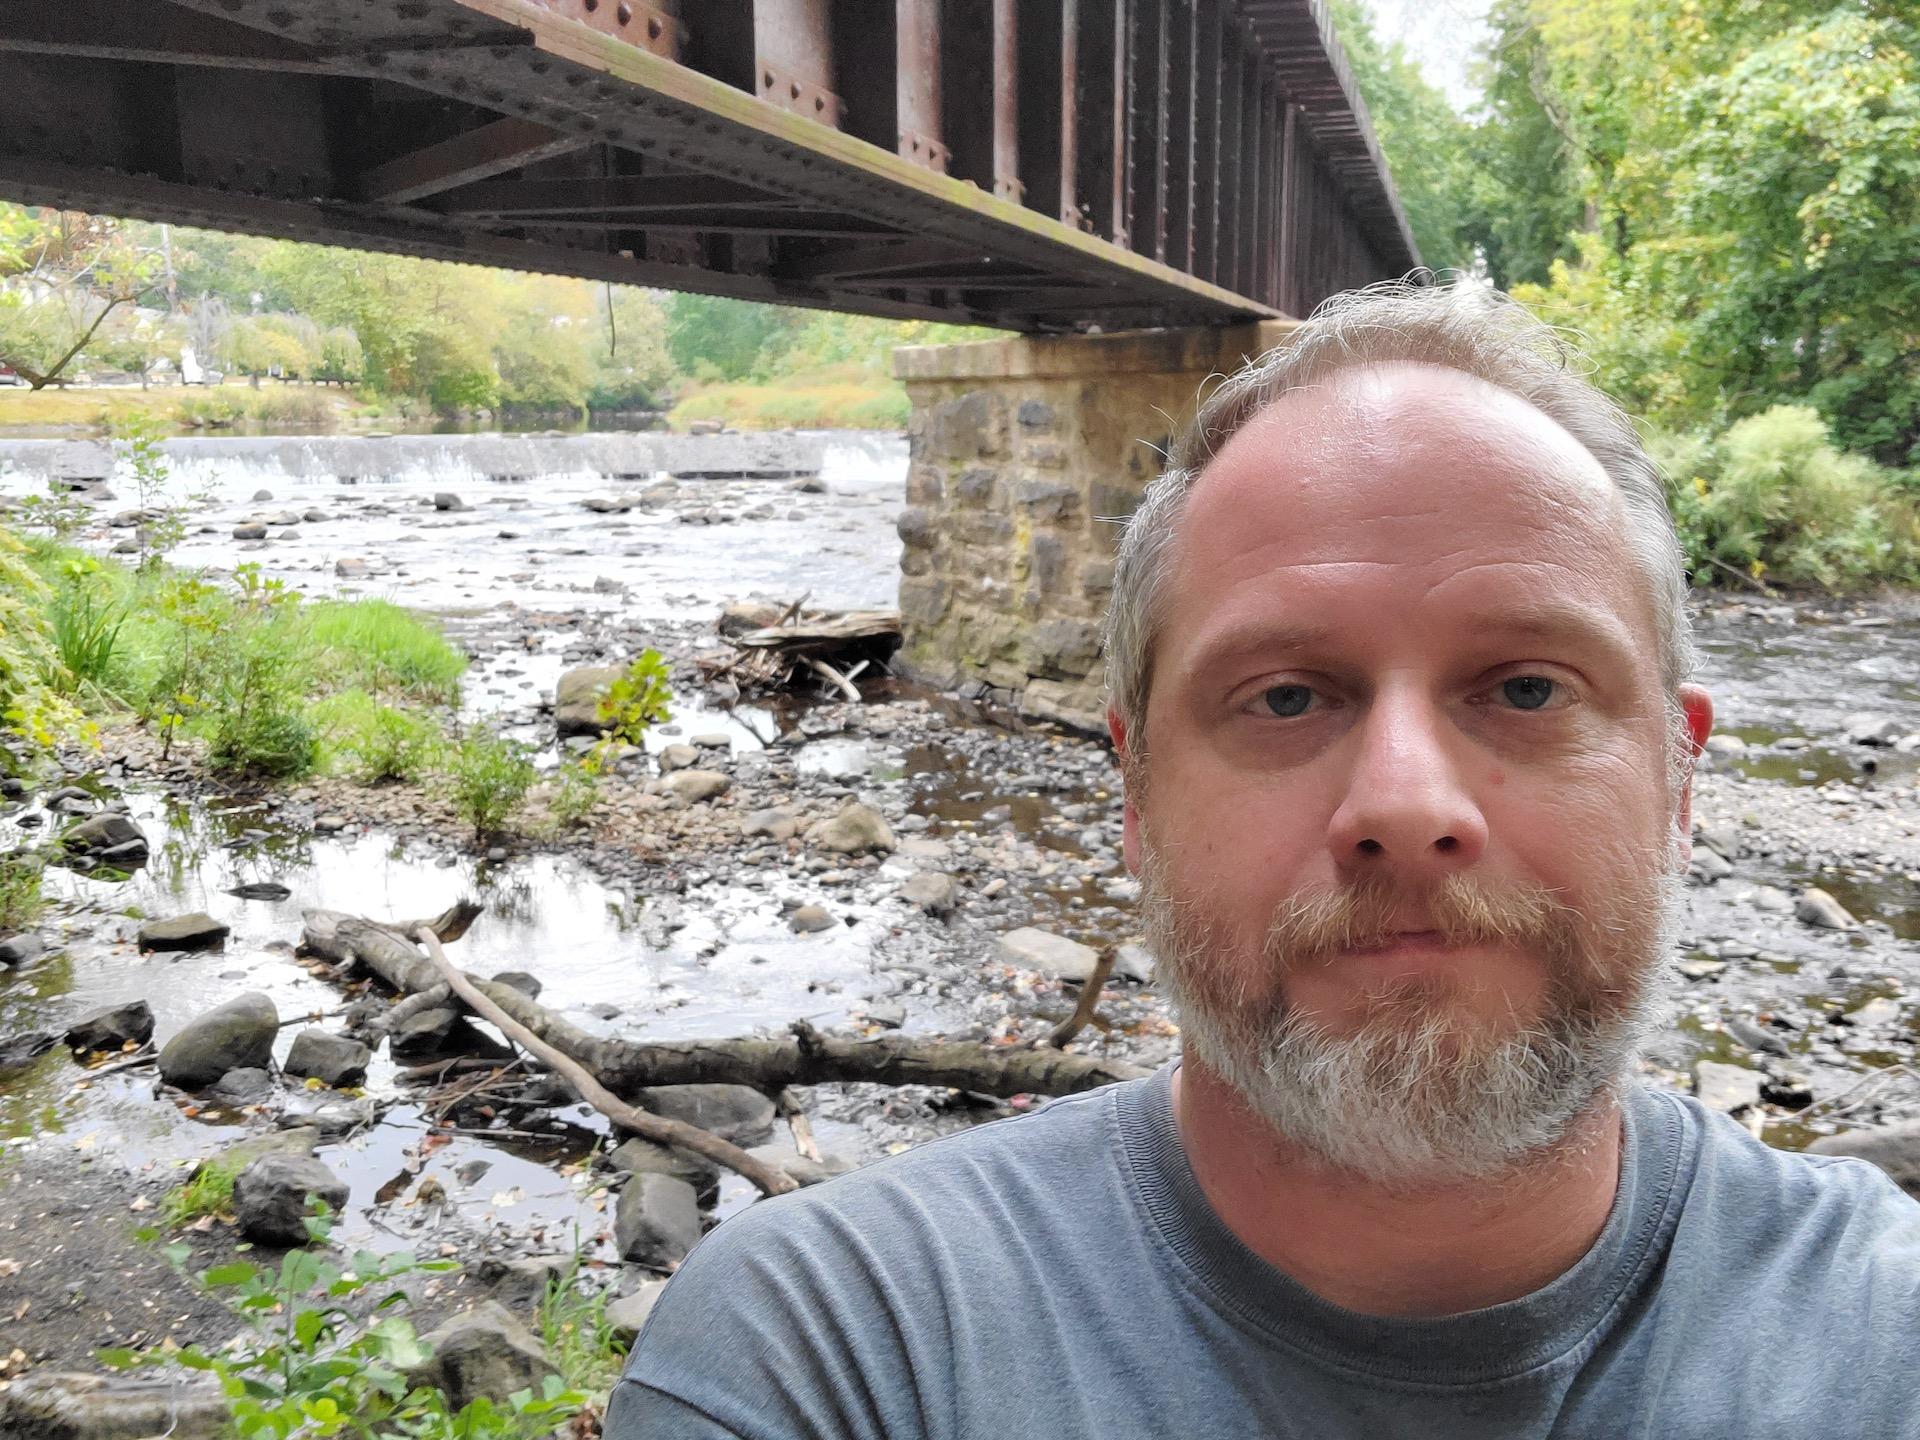 Samsung Galaxy Fold review camera sample bridge selfie